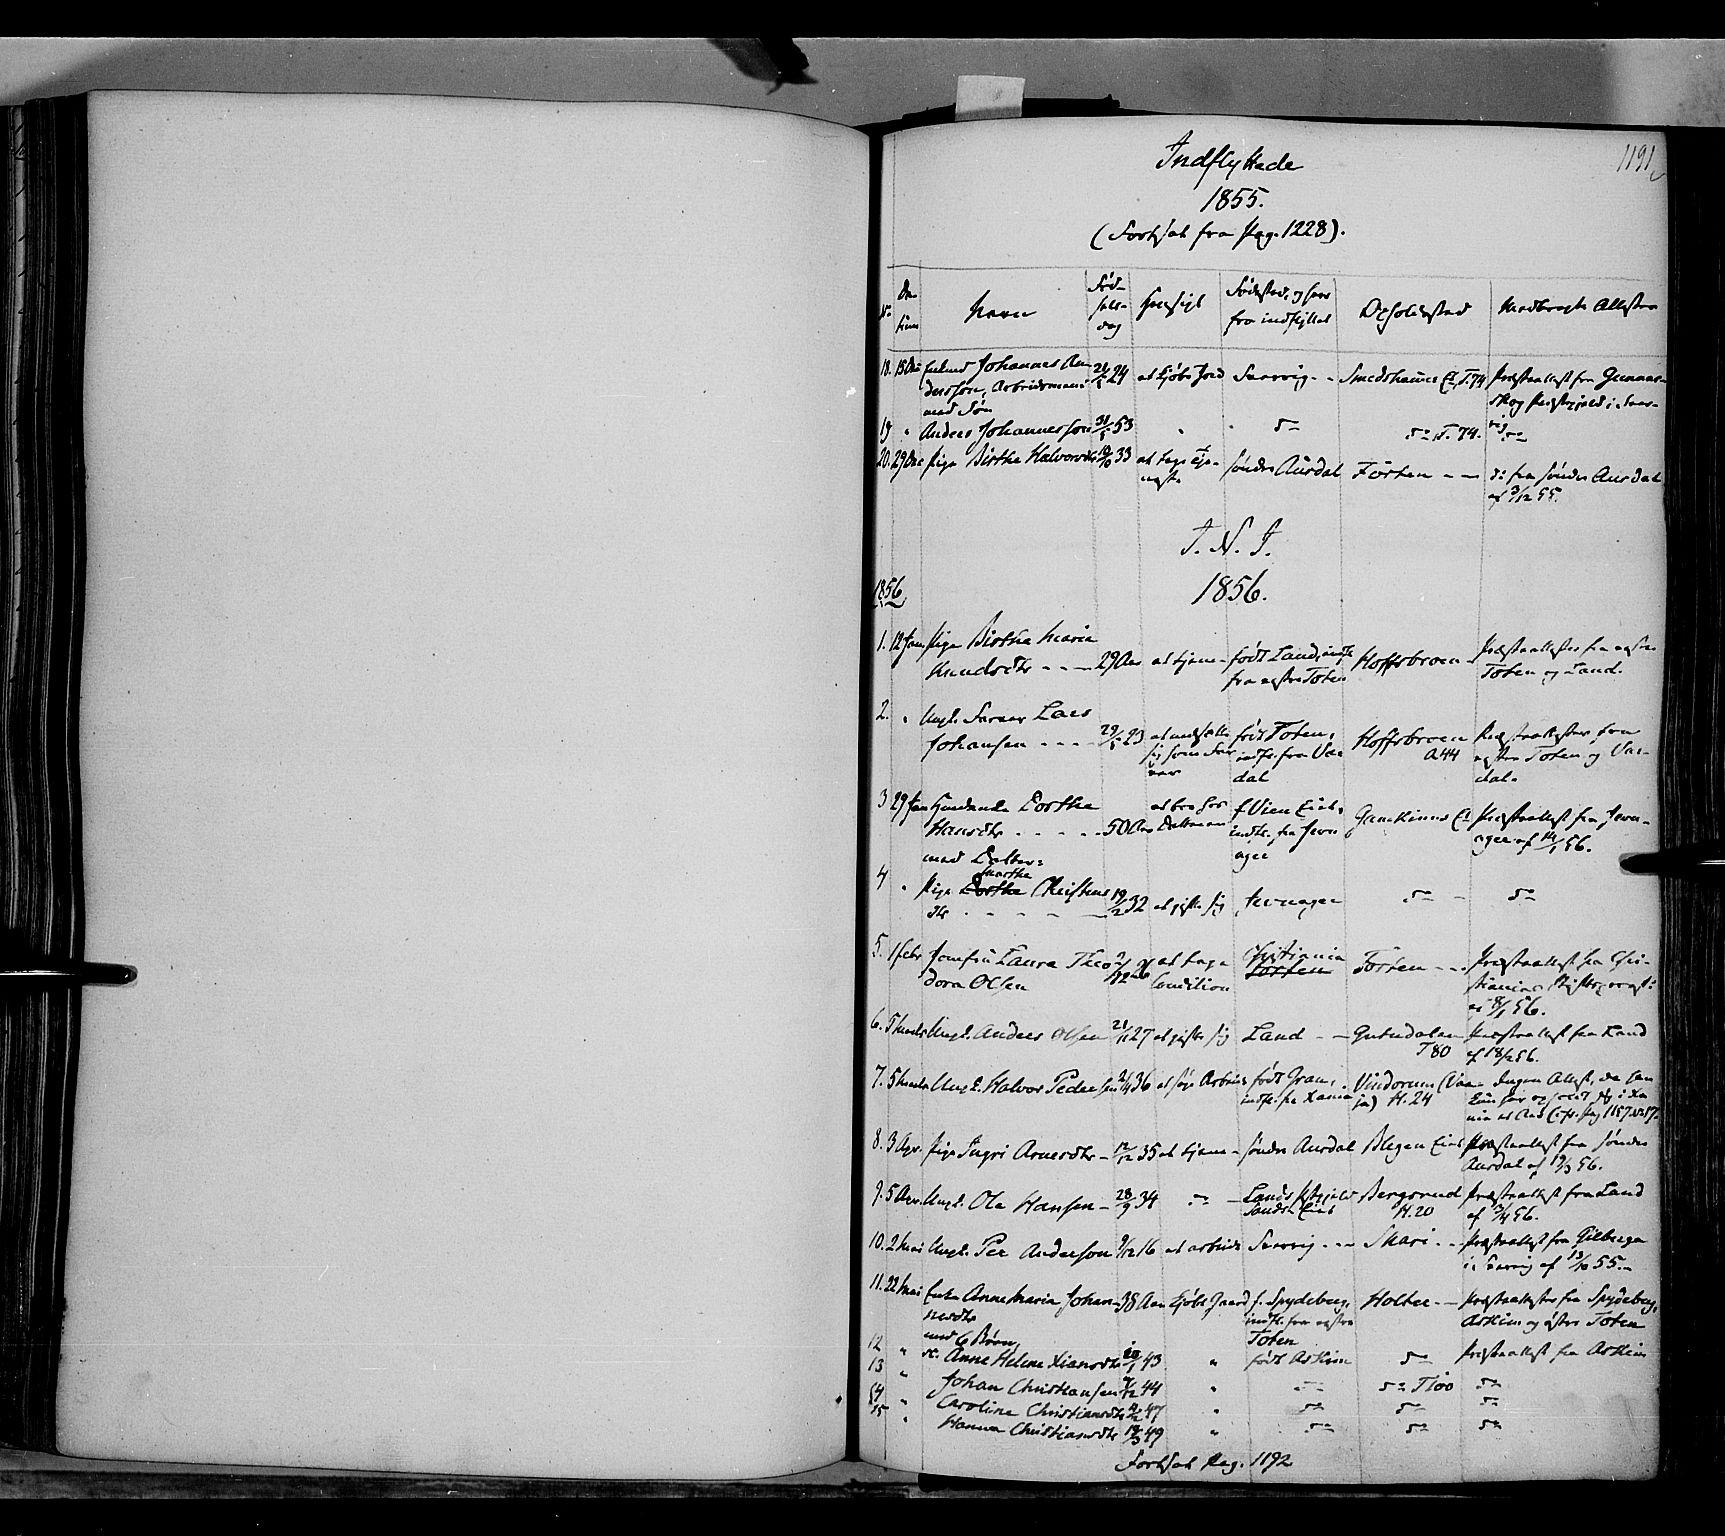 SAH, Gran prestekontor, Ministerialbok nr. 11, 1842-1856, s. 1190-1191